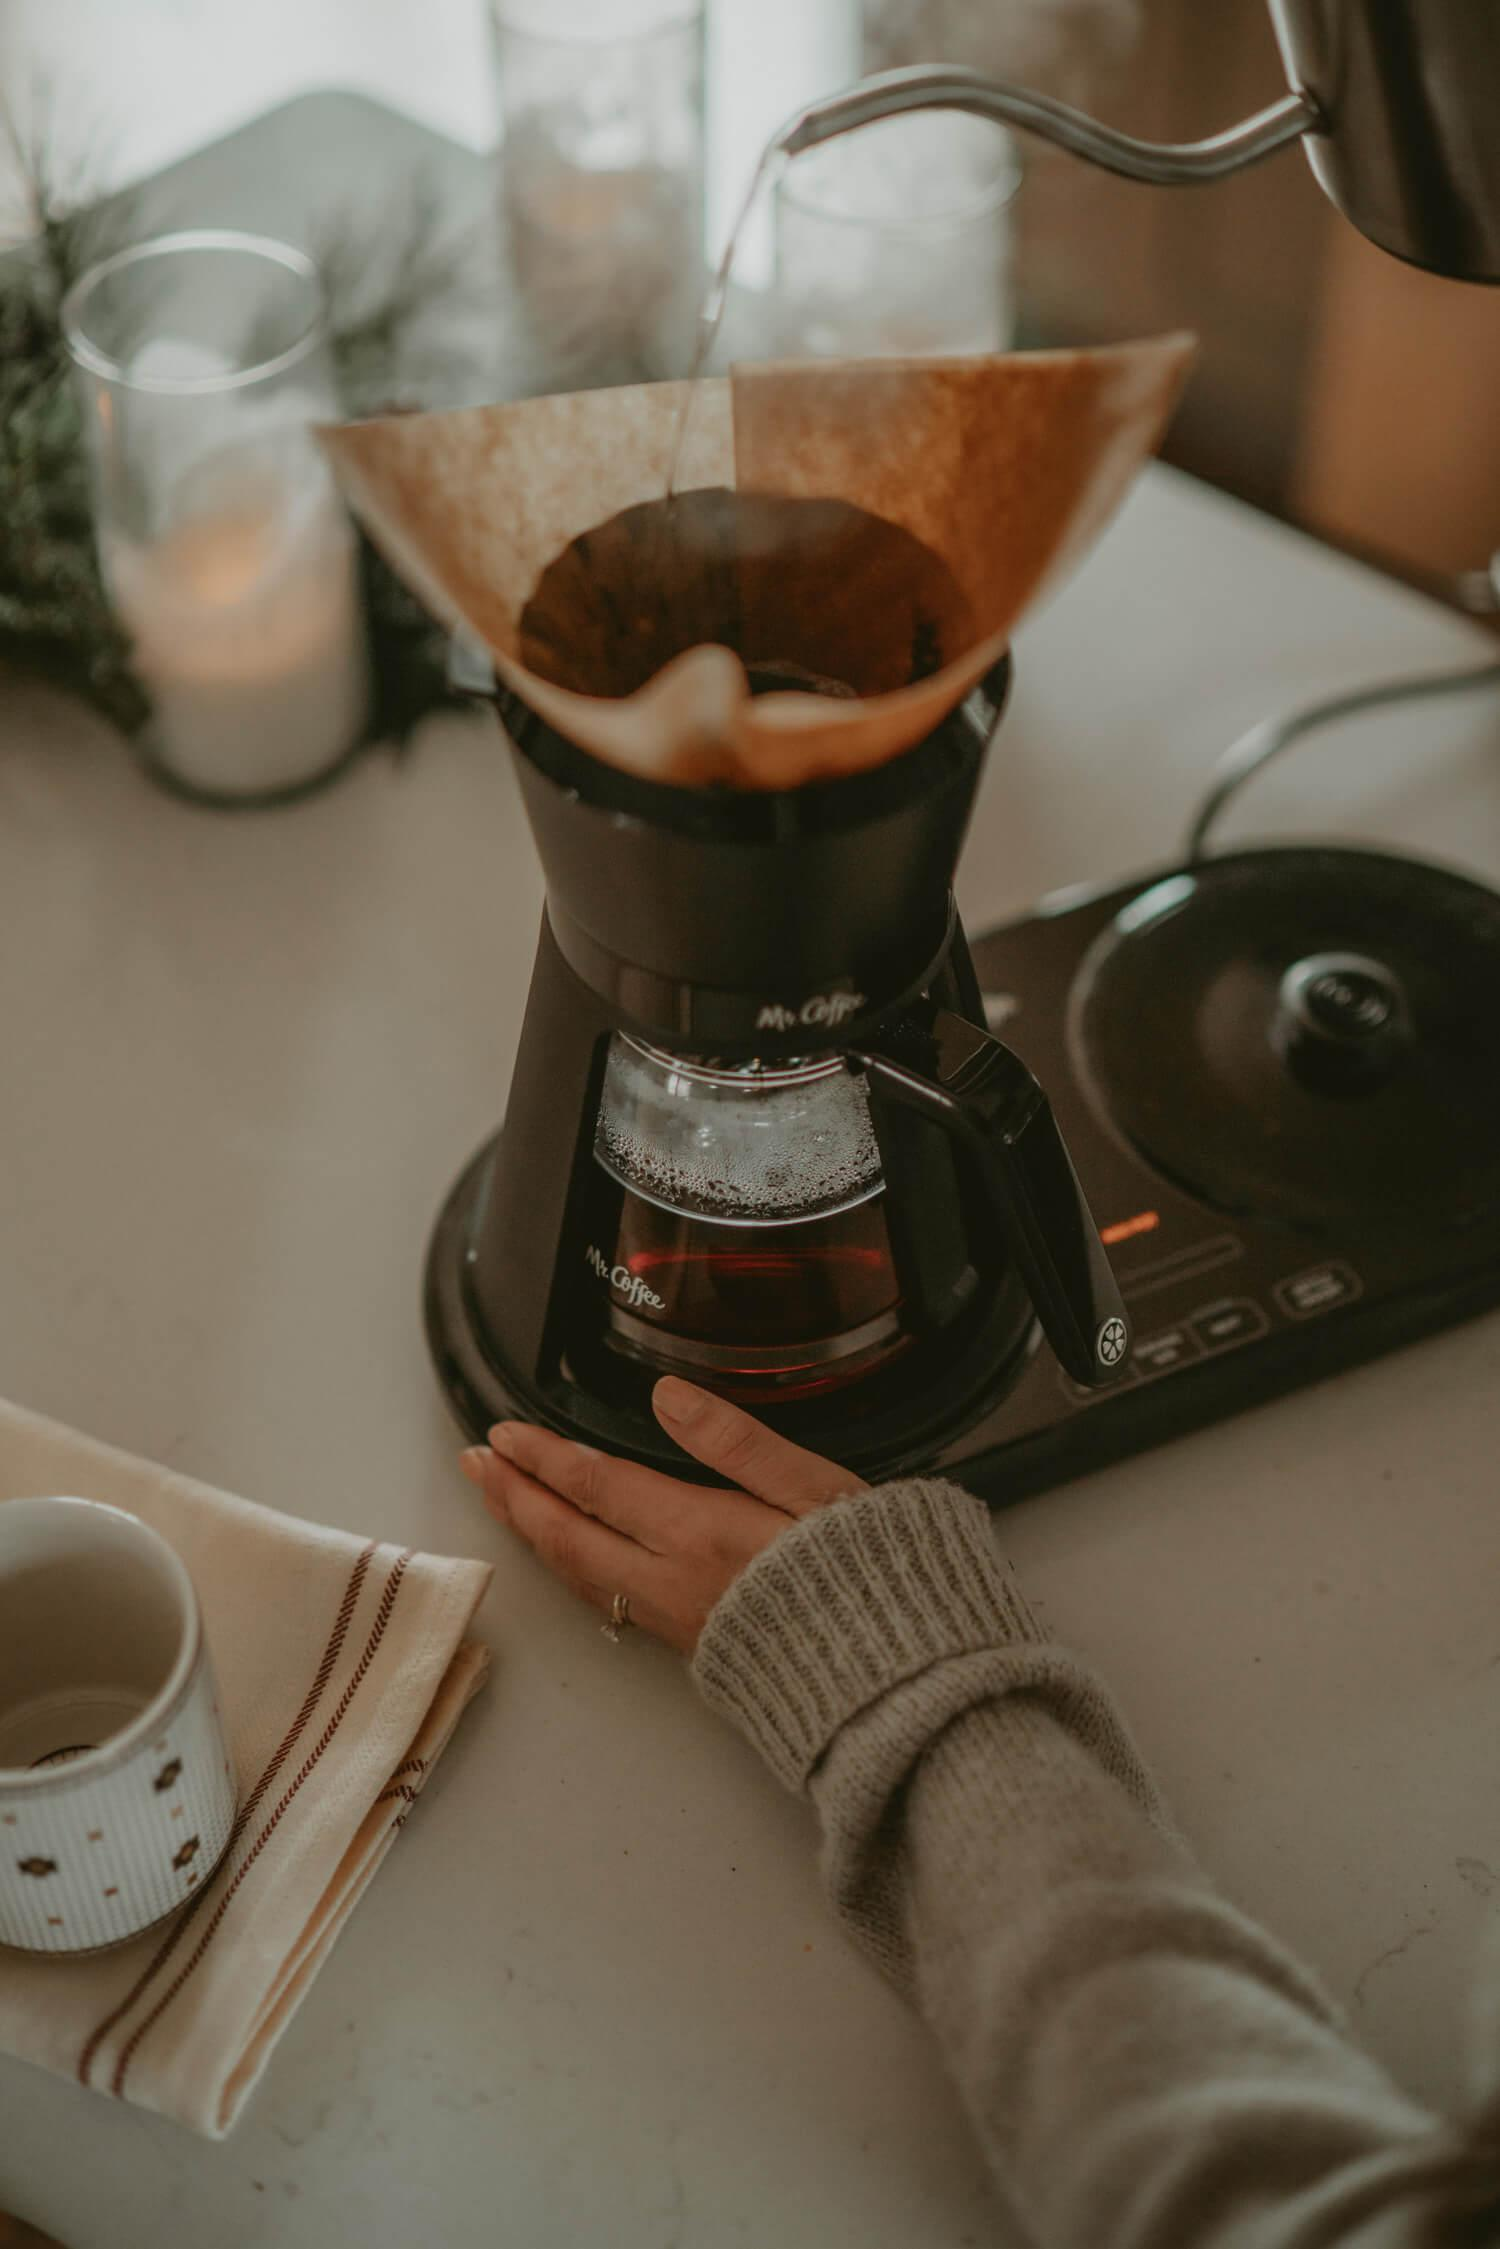 Mr Coffee 10